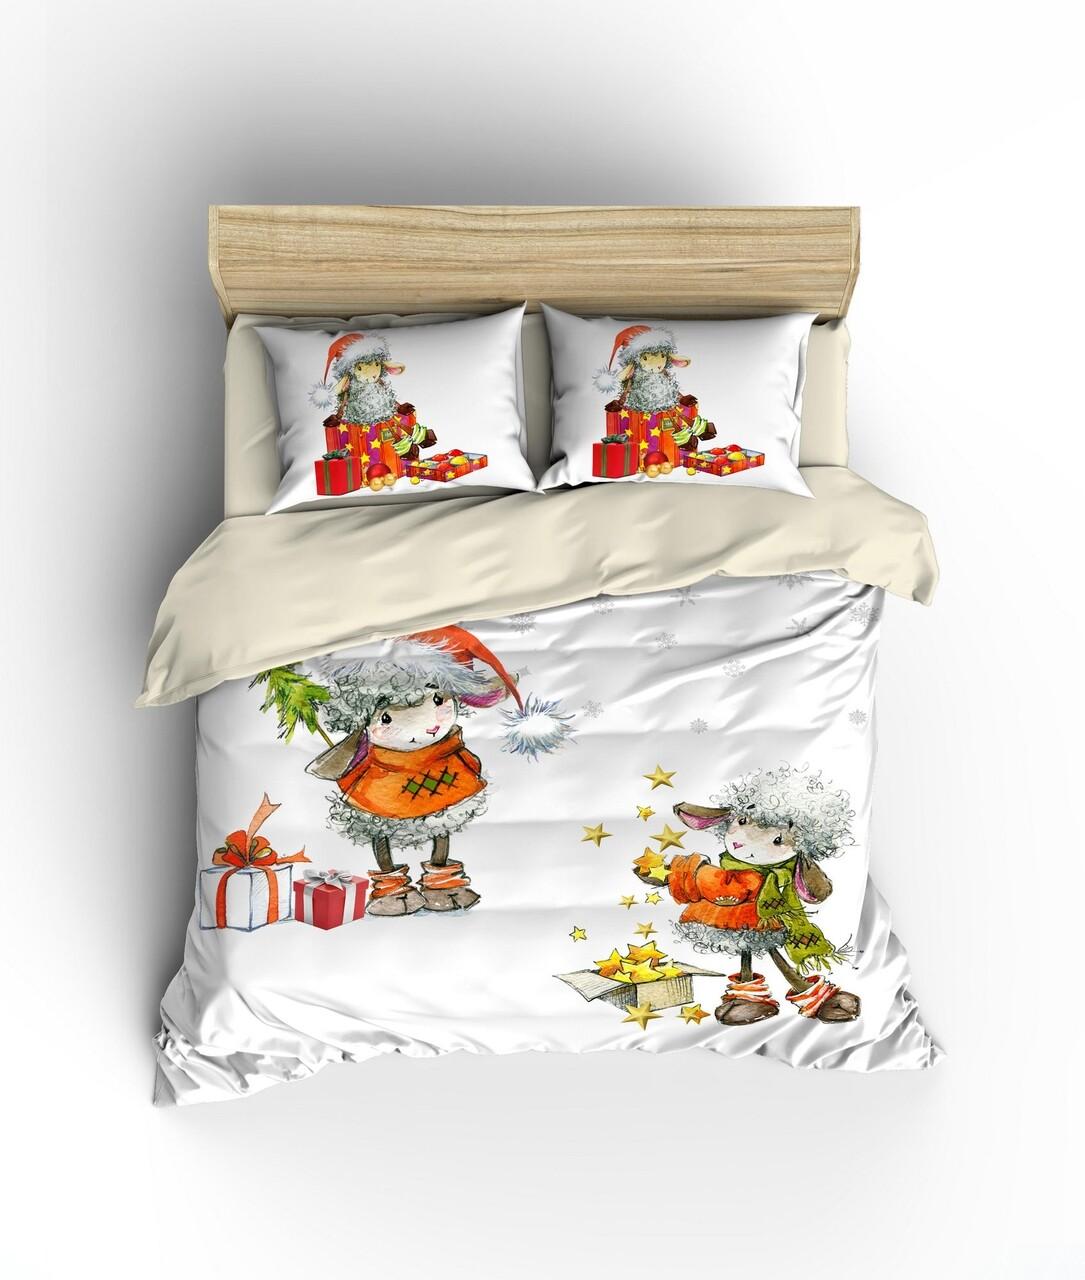 Lenjerie de pat, 2 persoane King Size, Colors of Fashion, print 3D, 331, Bumbac Ranforce, 3 piese